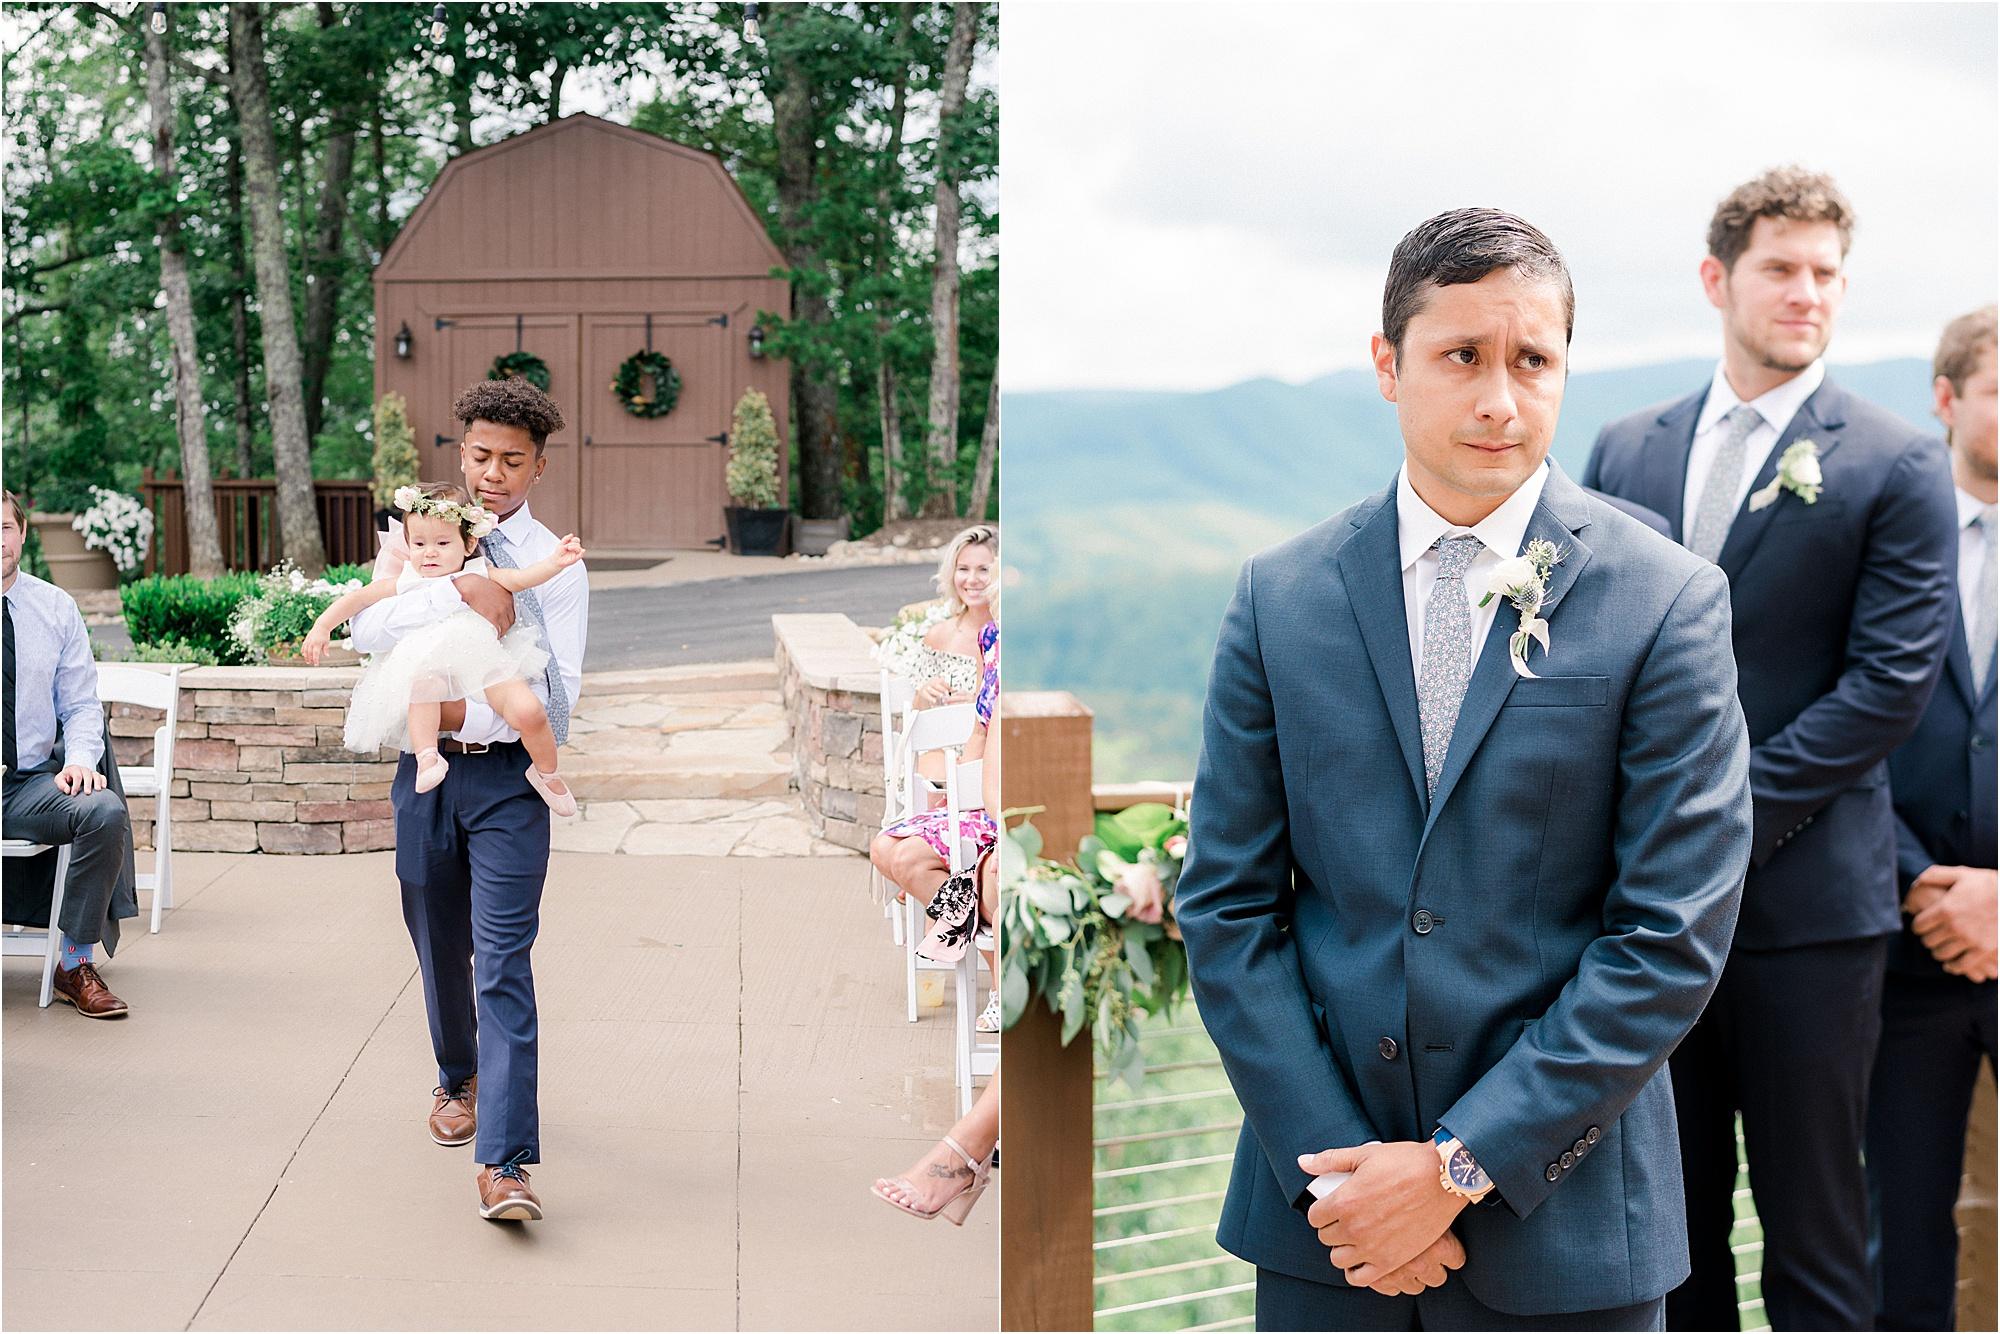 groom watching flower girl and bride walk down the aisle